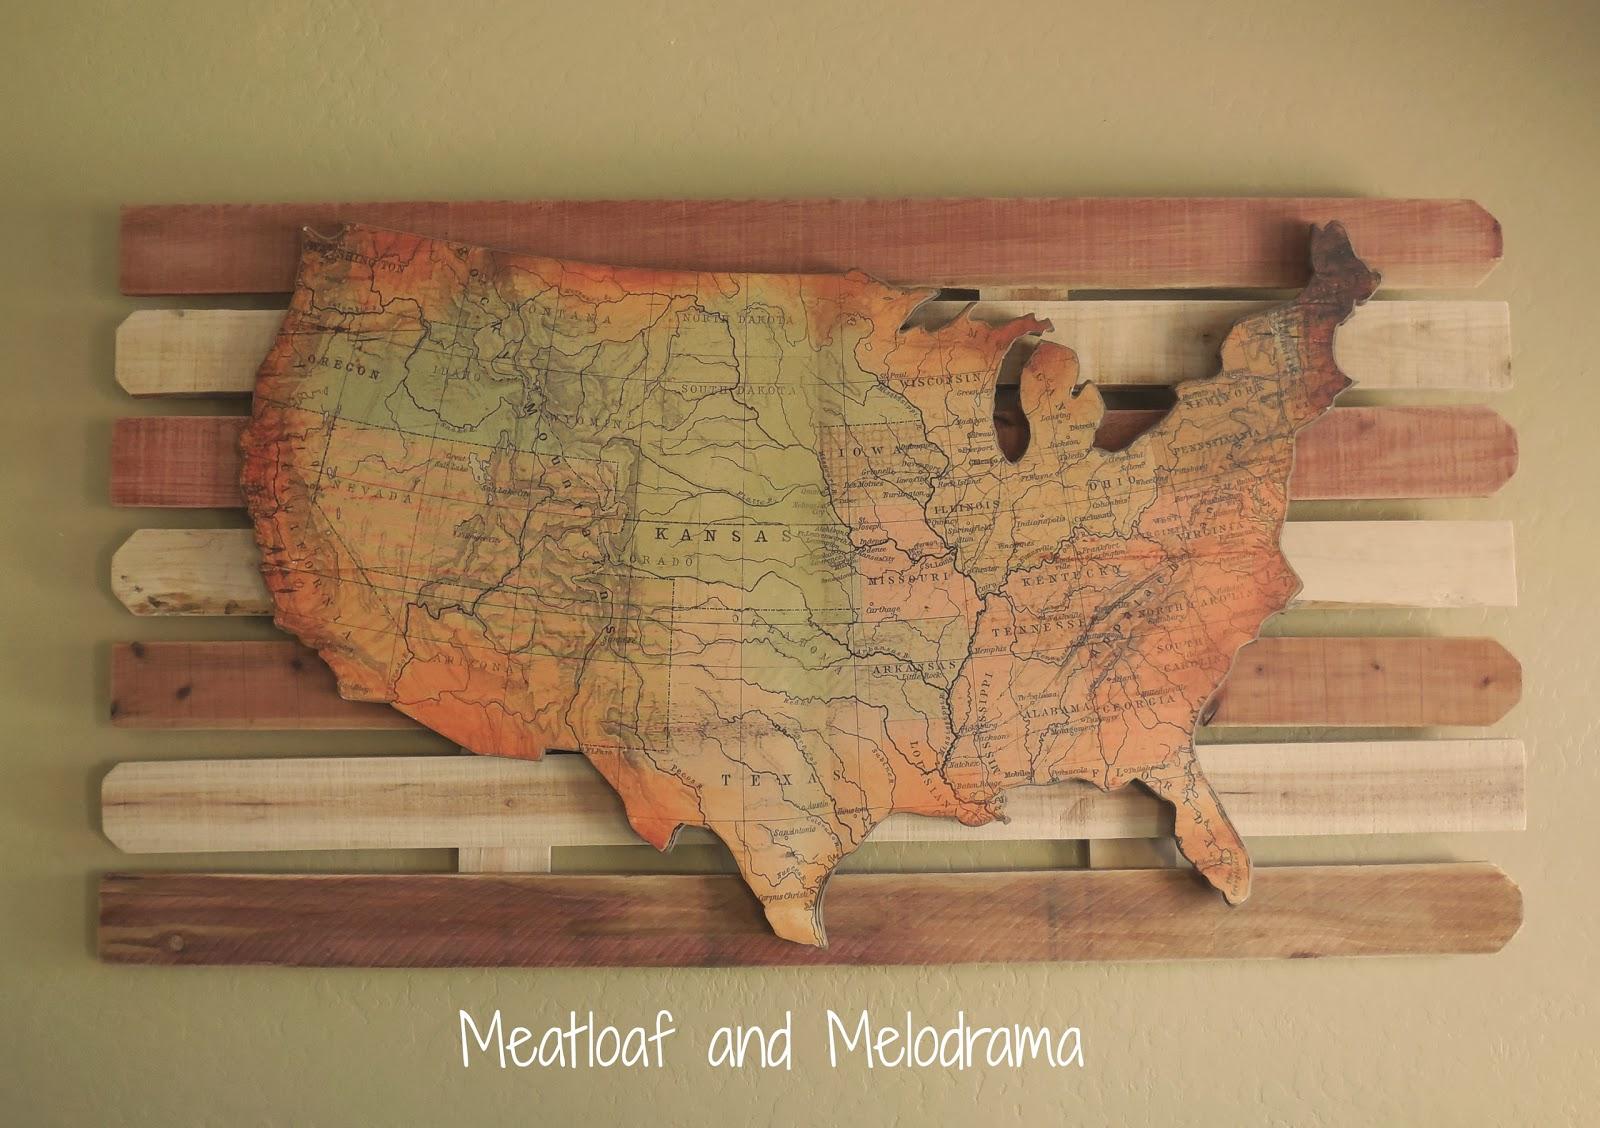 Rustic Wooden Wall Art Map, Wilmington Tan Paint